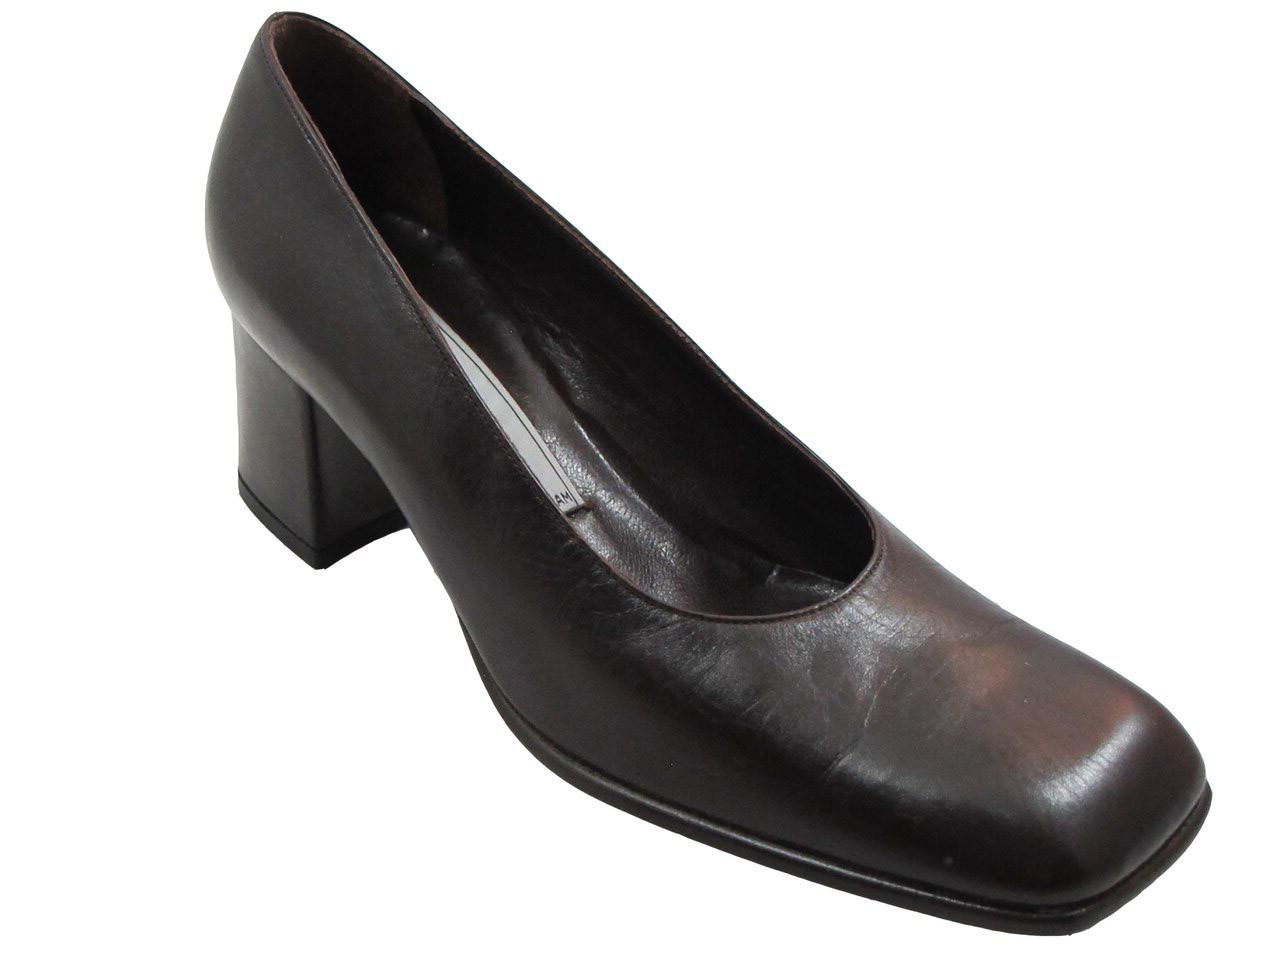 Alberto Zago 1554 Women's Square Toe Mid Heel Pumps in Black